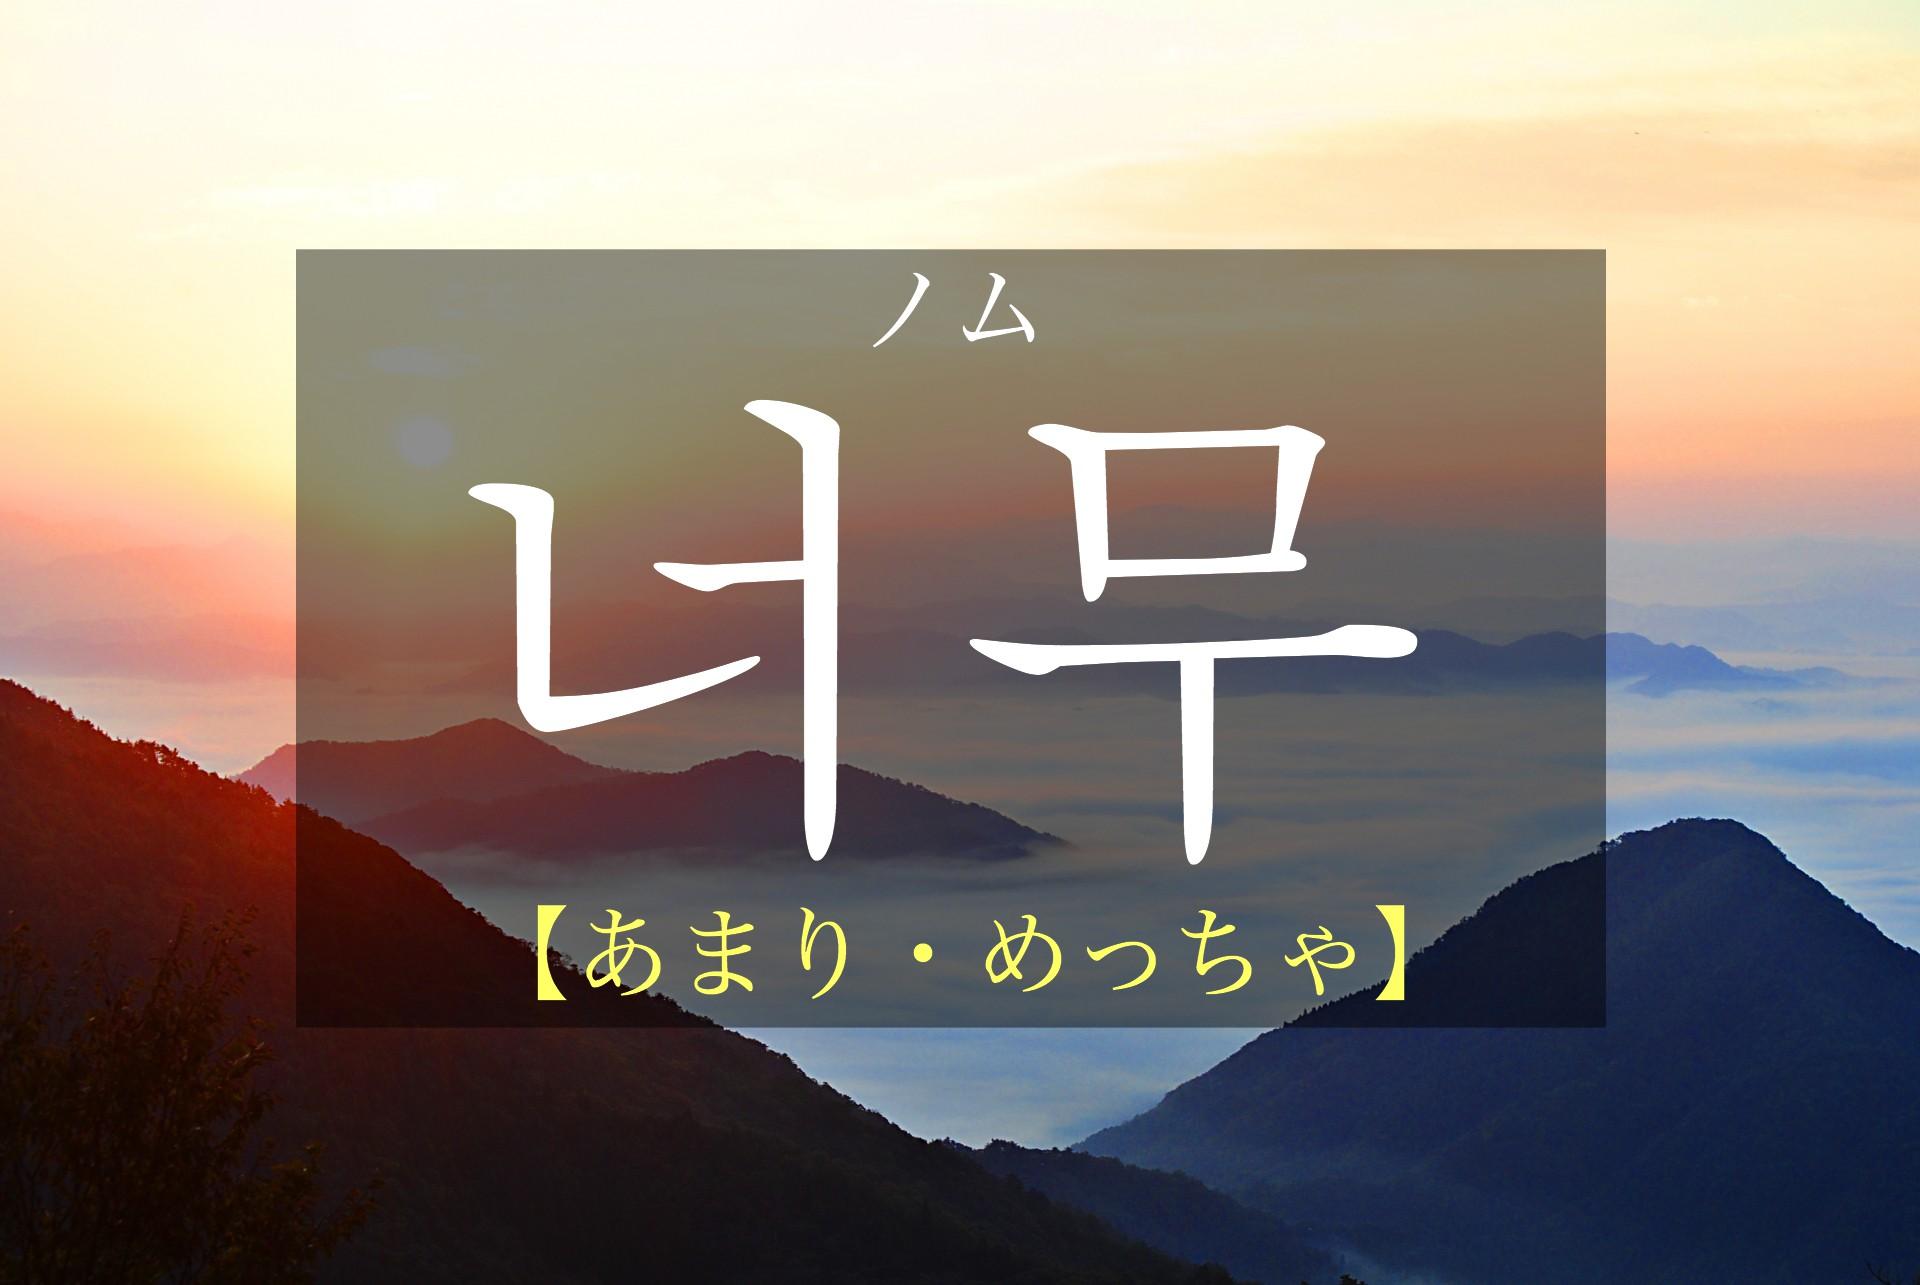 koreanword-too